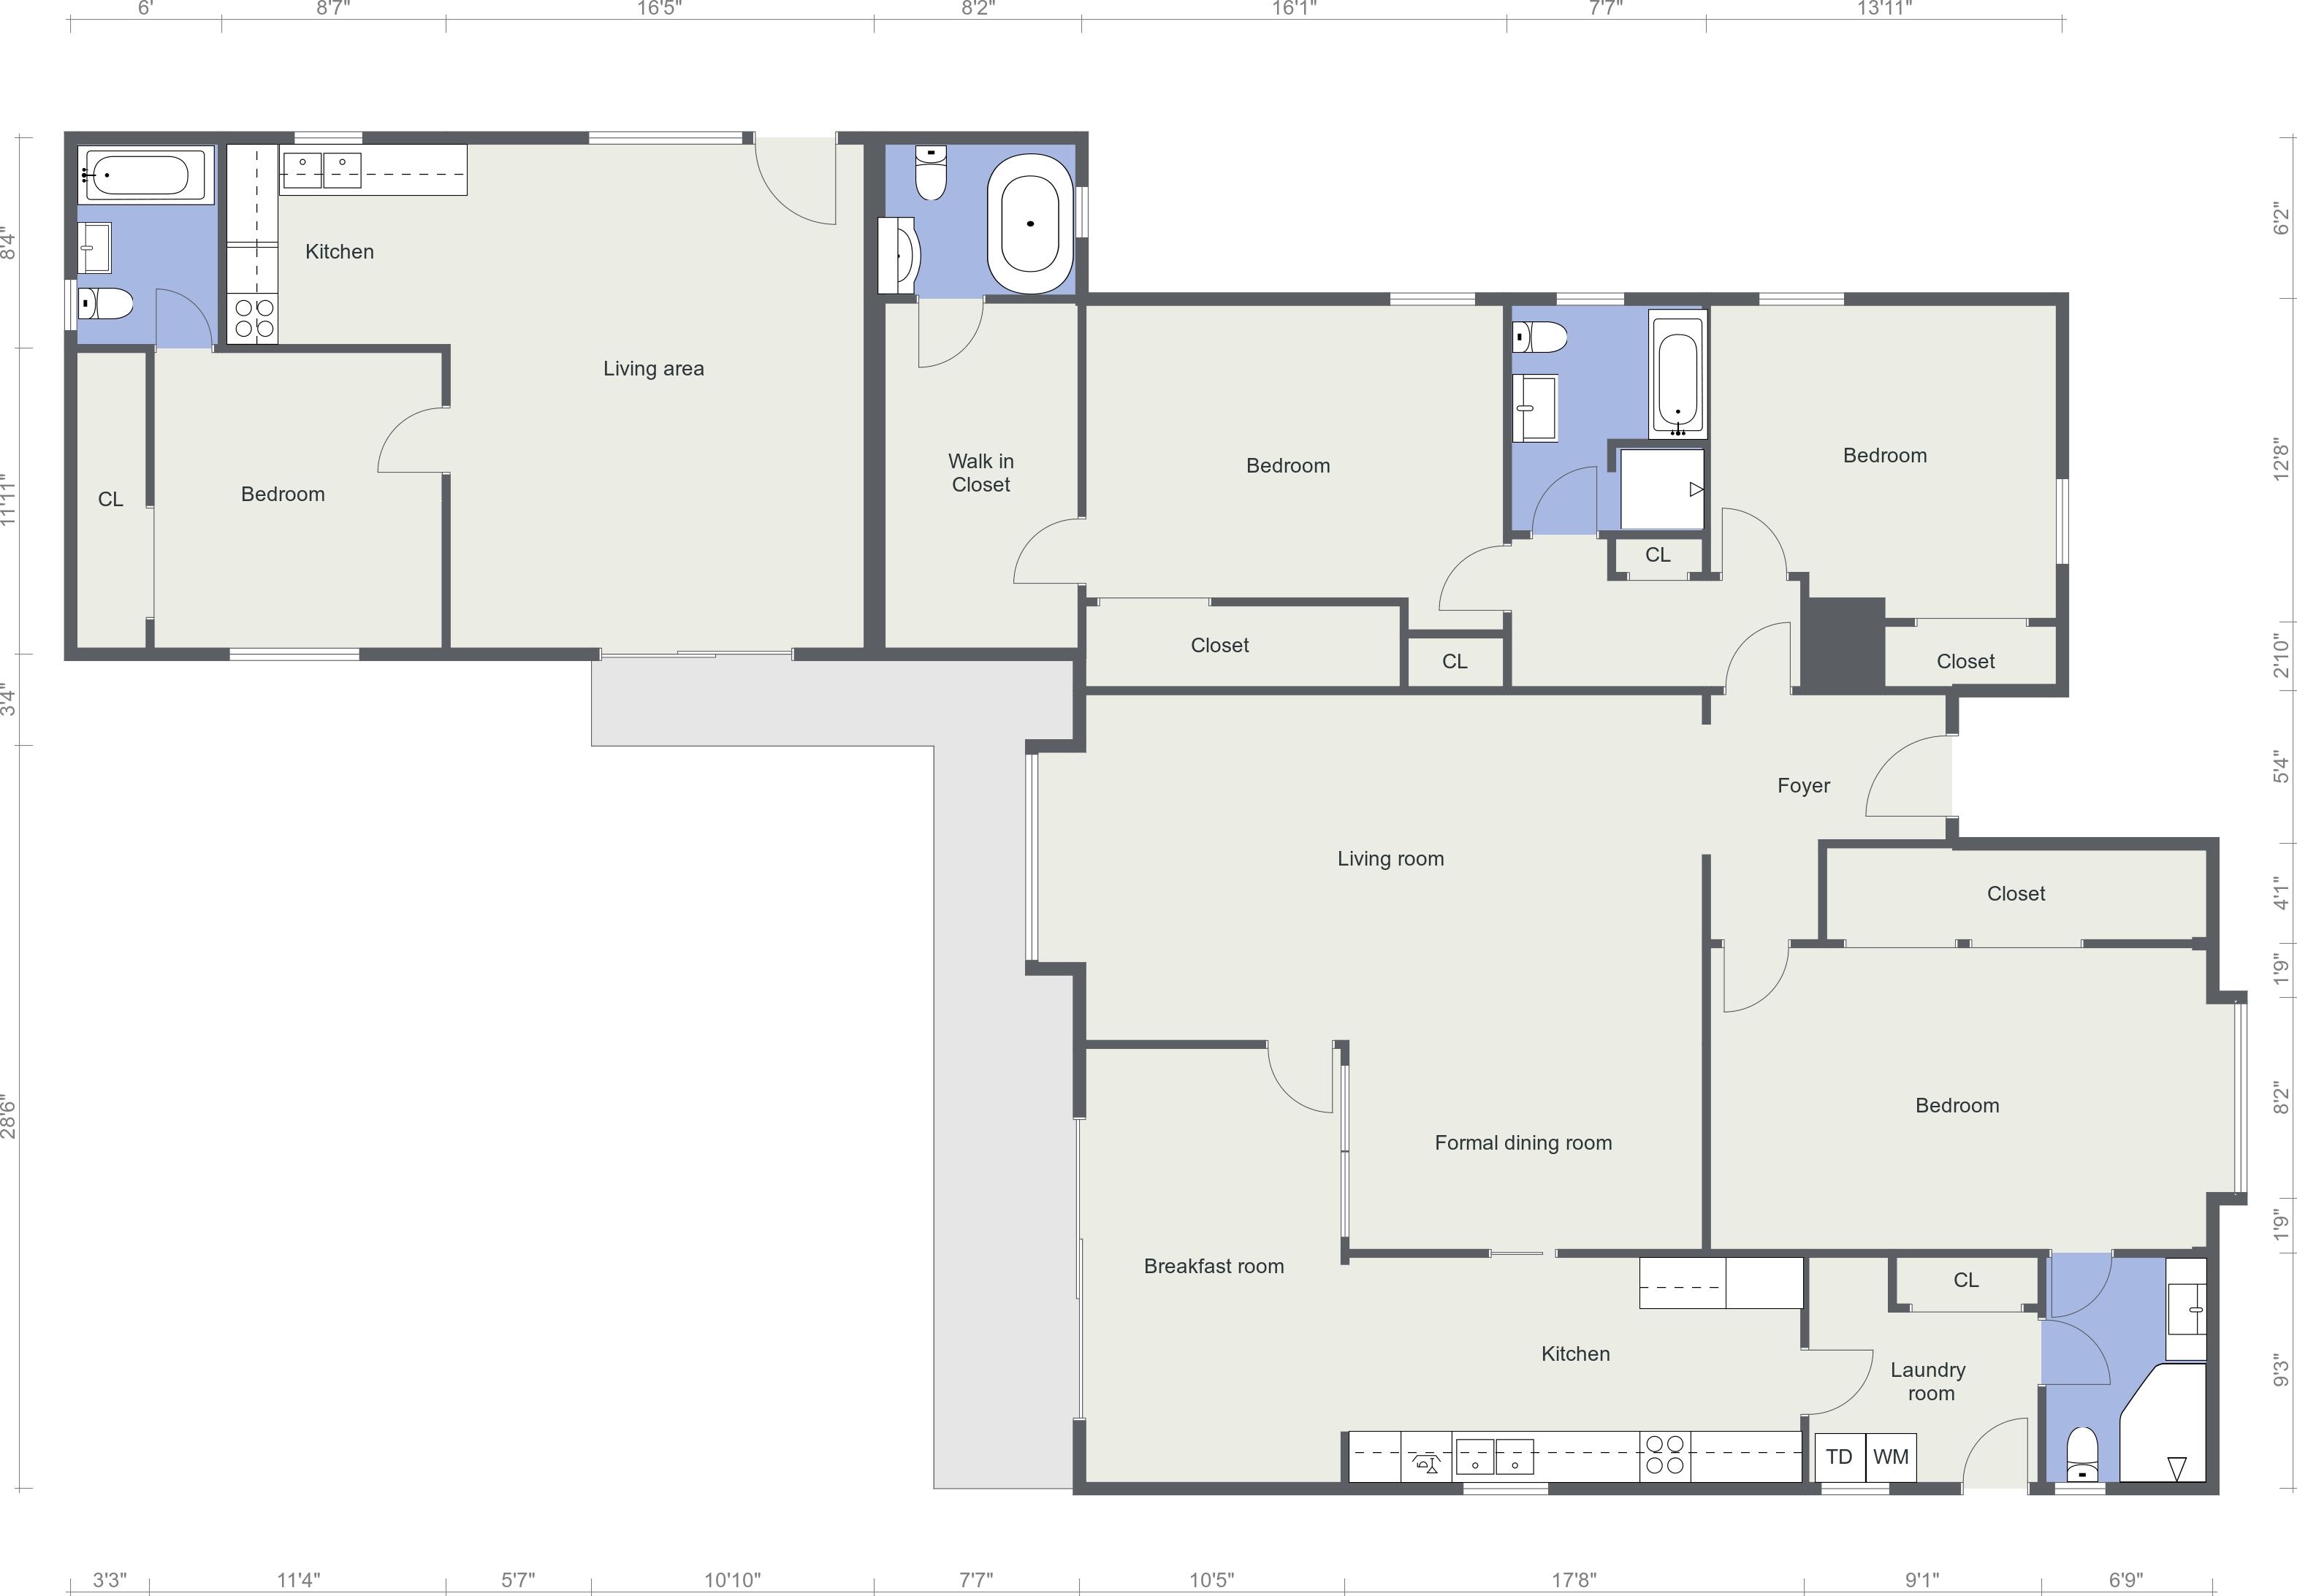 1900 Sq Ft Ranch House Plans Get House Design Ideas